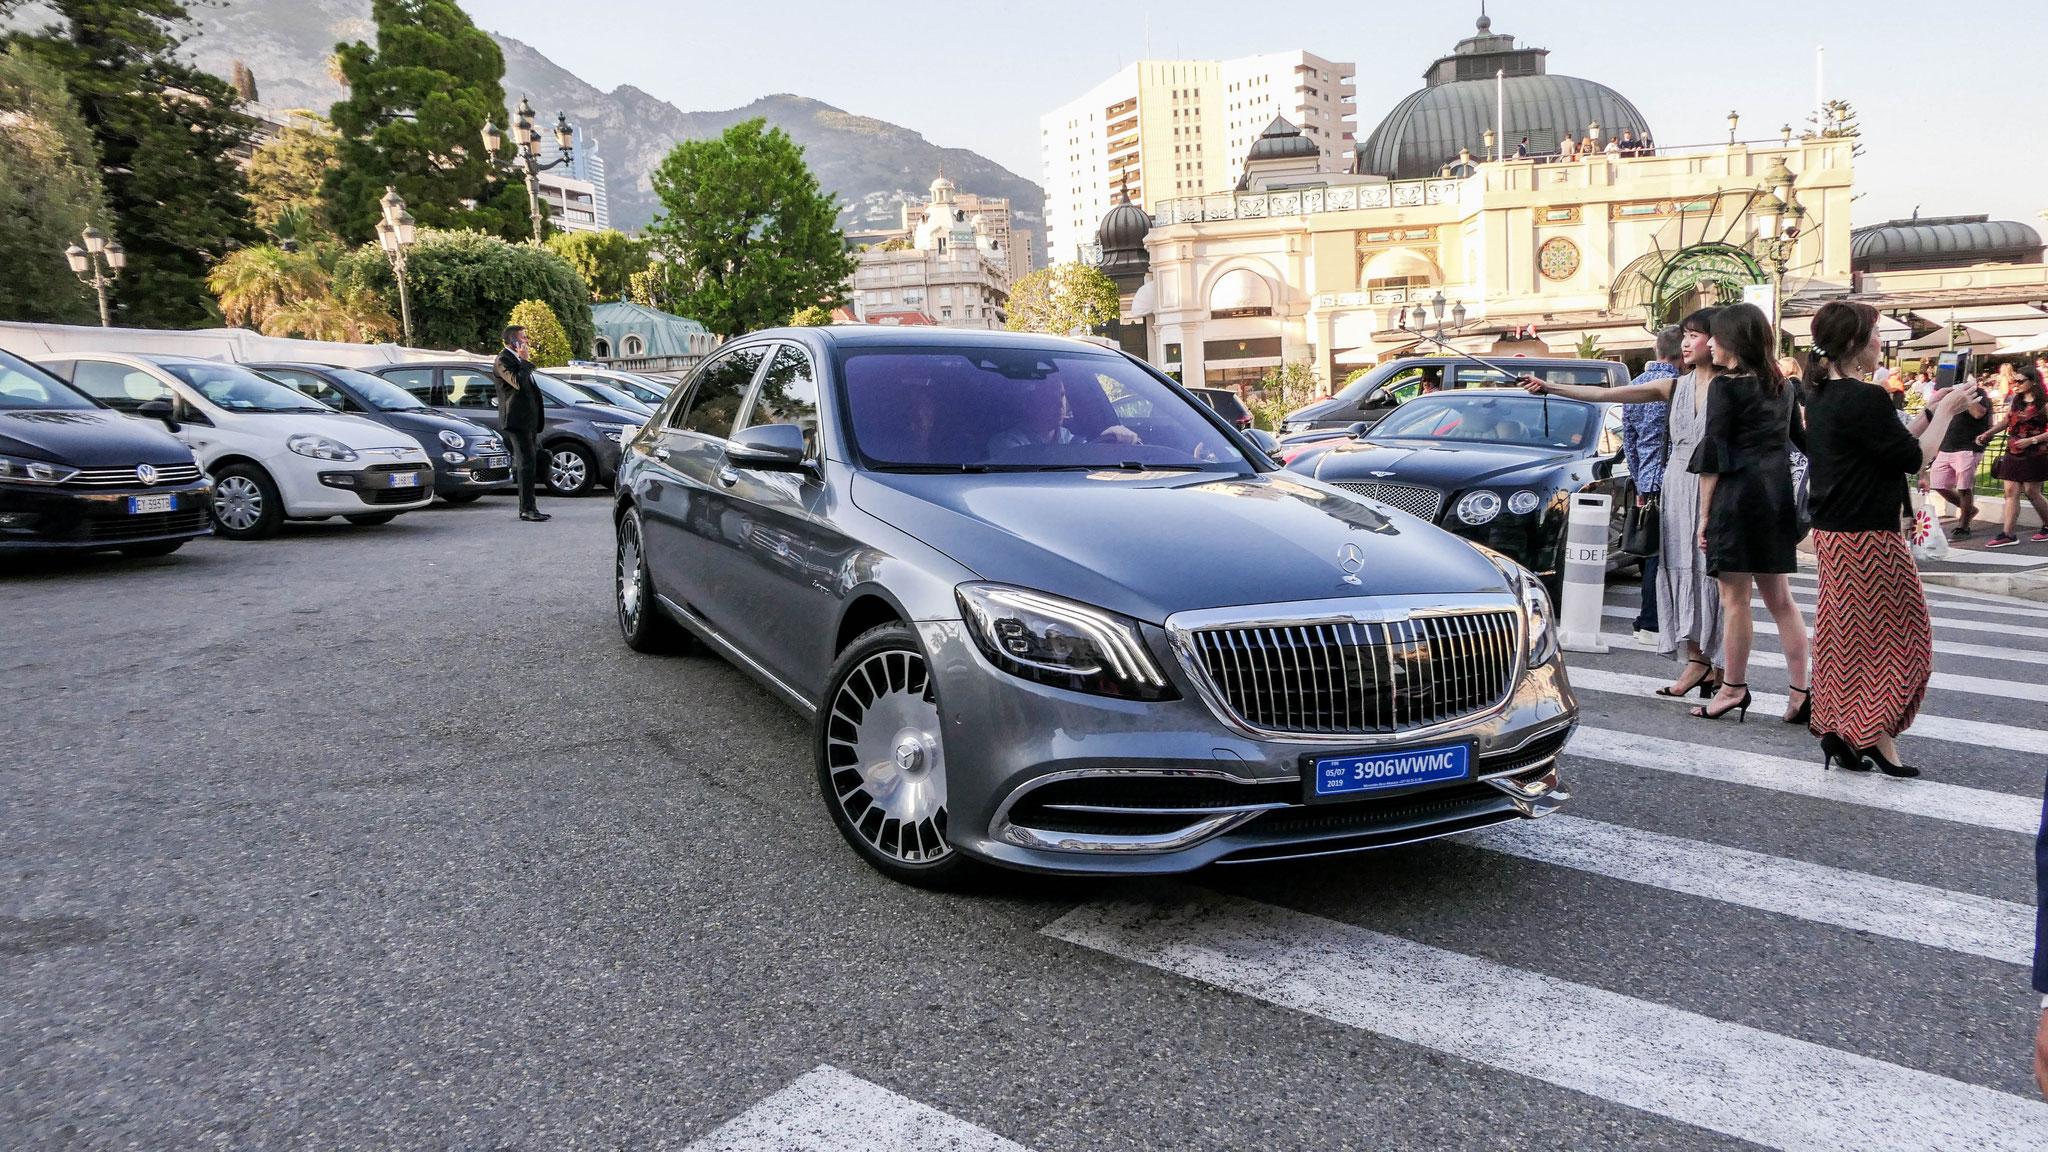 Mercedes Maybach S560 - 3906-WW-MC (MC)